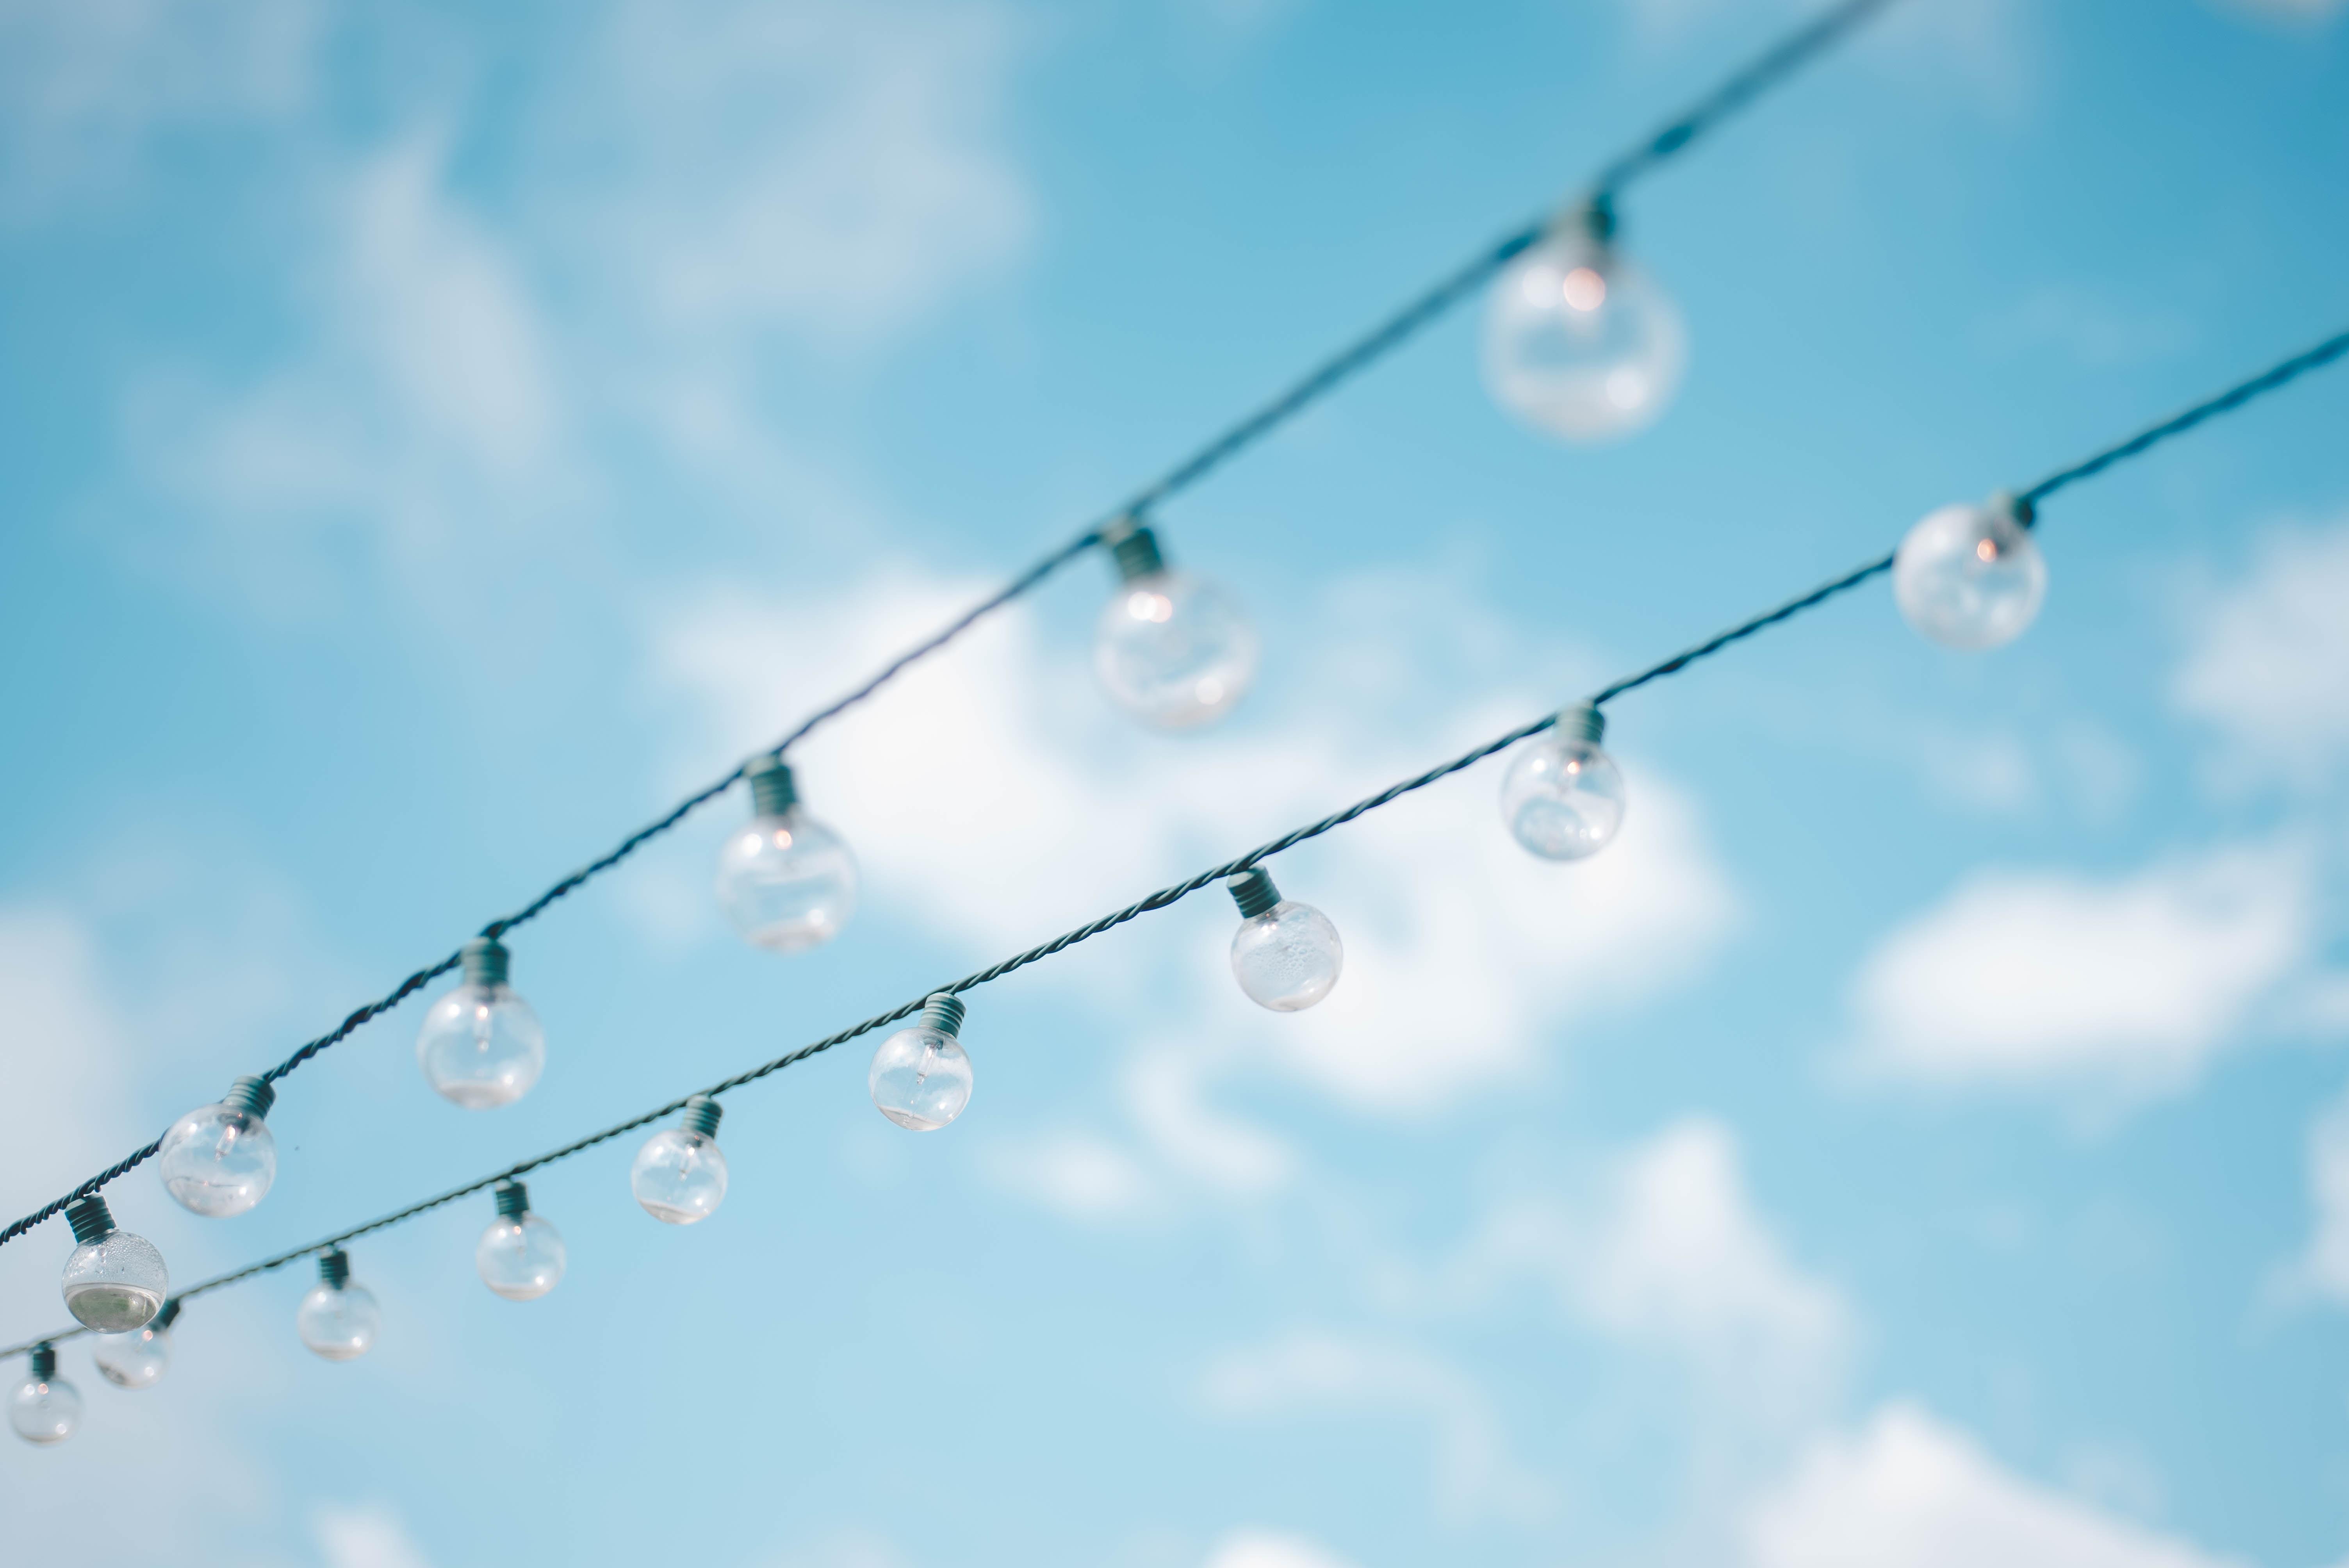 tilt lens photography of string lights under cloudy skies